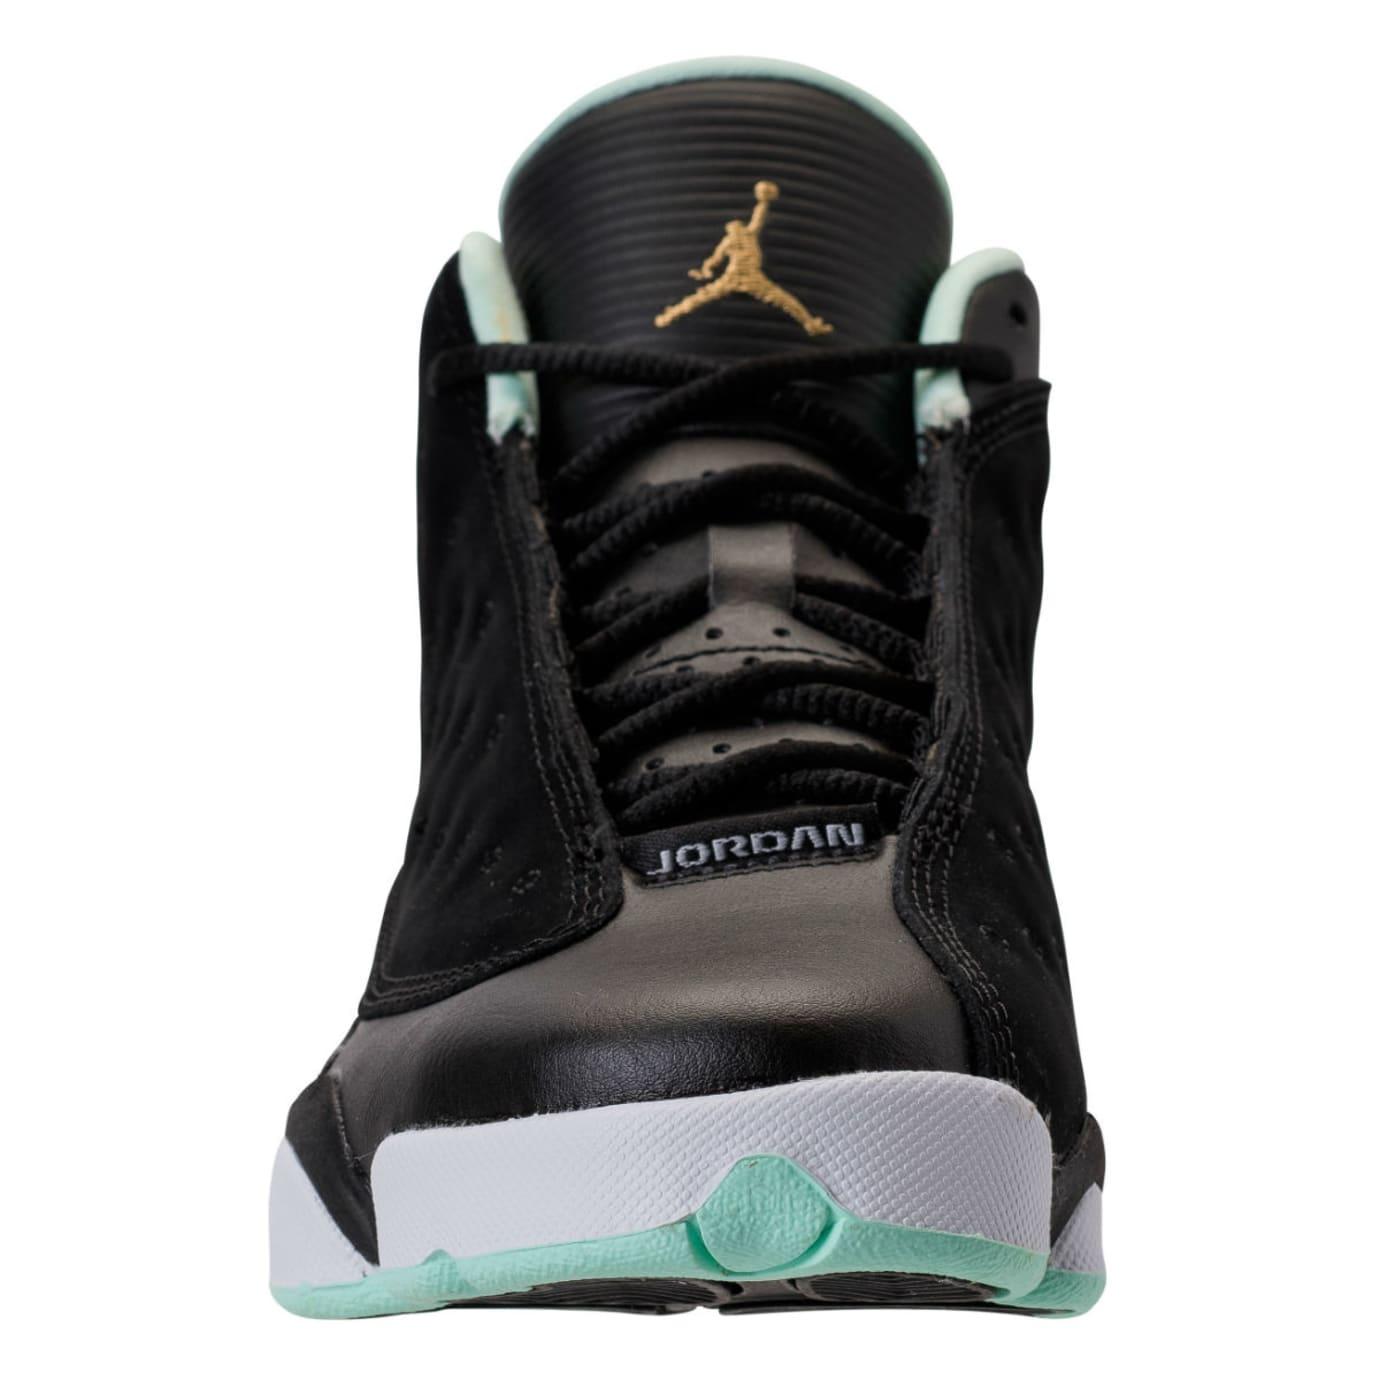 quality design 78c09 56760 Air Jordan 13 GS Mint Foam Release Date Front 439358-015